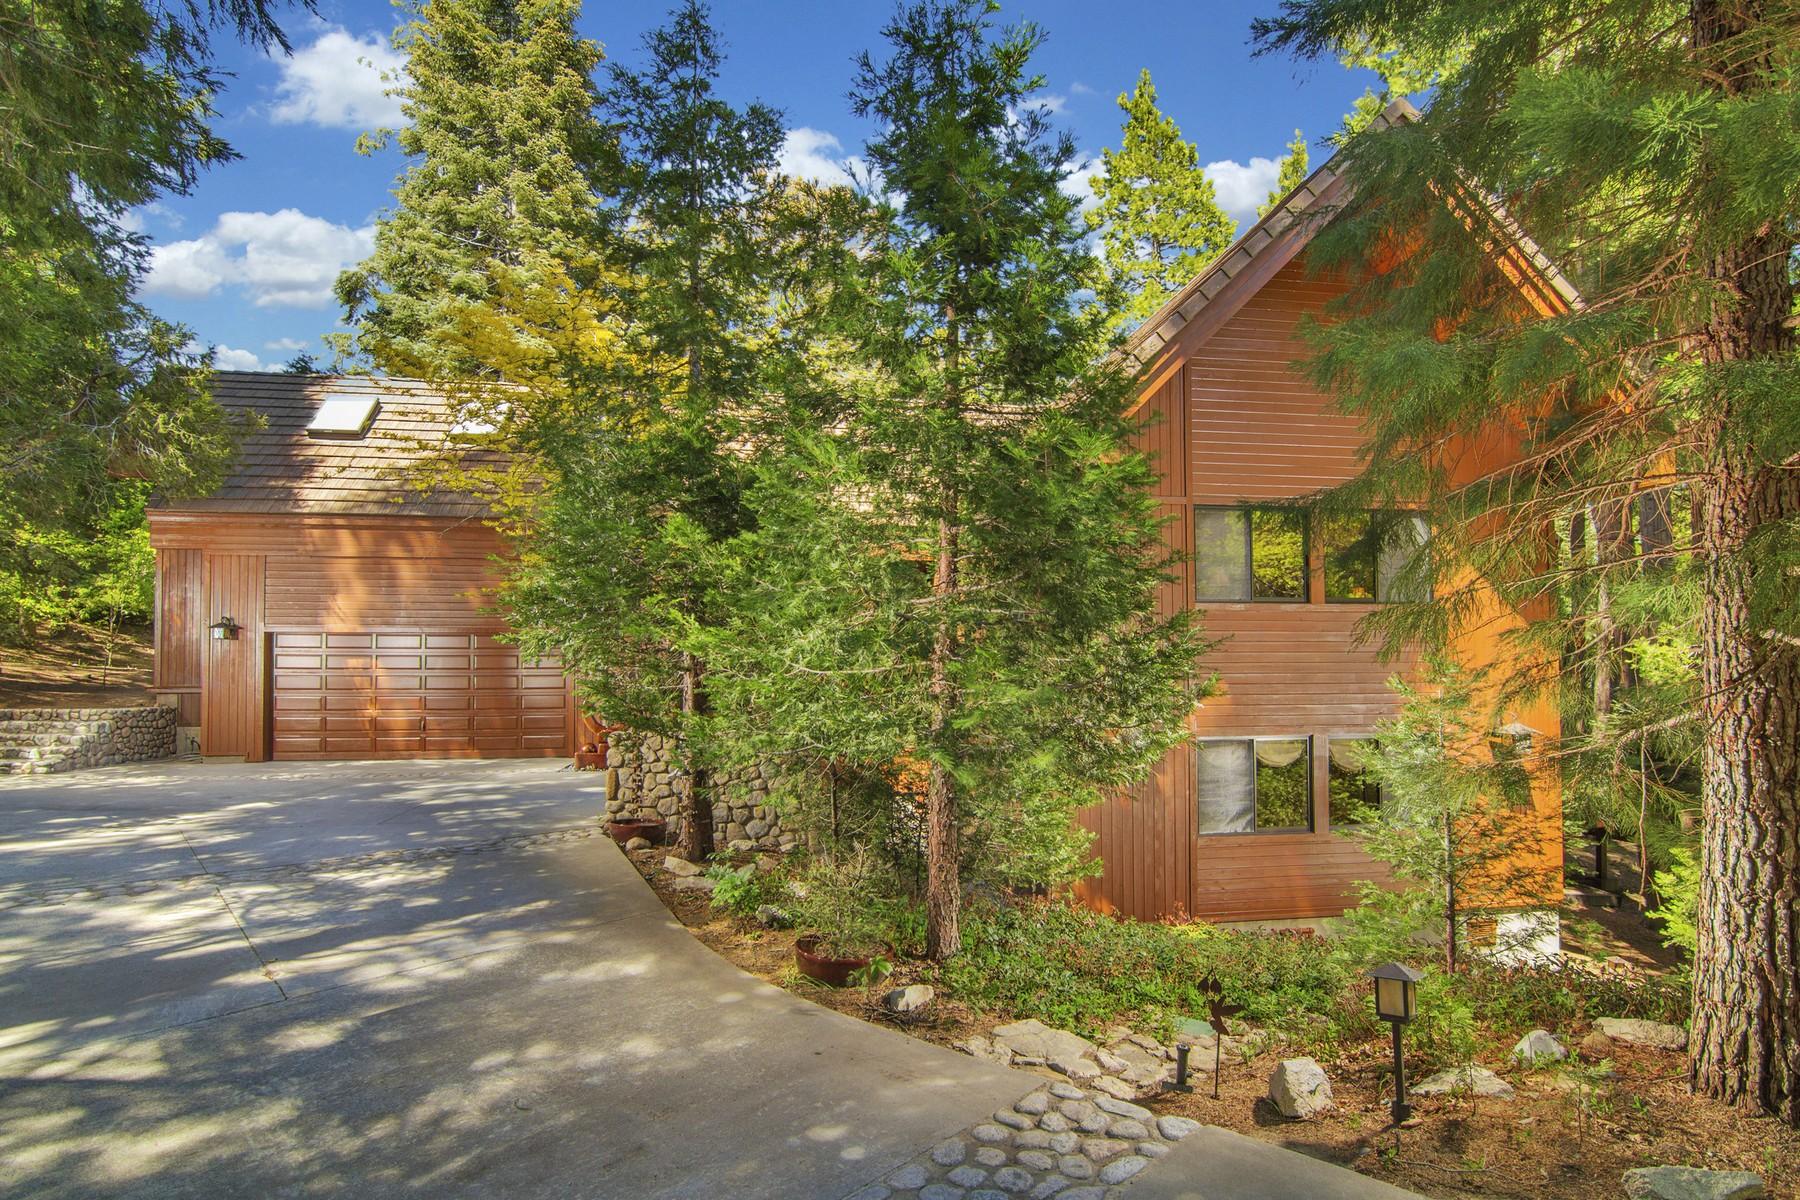 Single Family Homes for Sale at 484 Cedar Ridge Drive, Lake Arrowhead, California 92352 484 Cedar Ridge Drive Lake Arrowhead, California 92352 United States